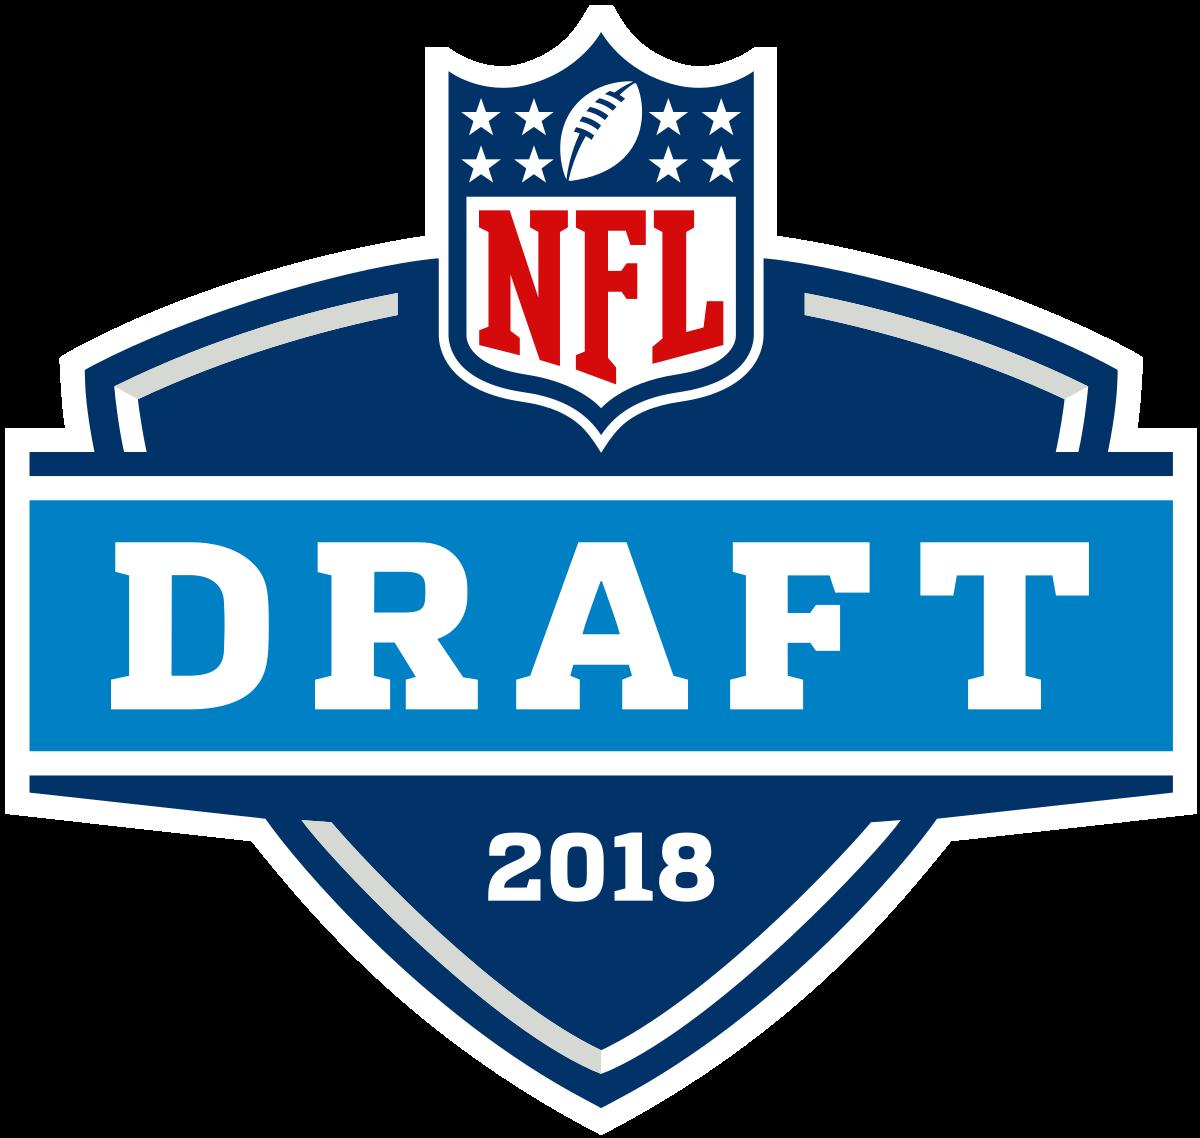 1200px-2018_NFL_Draft_logo.svg